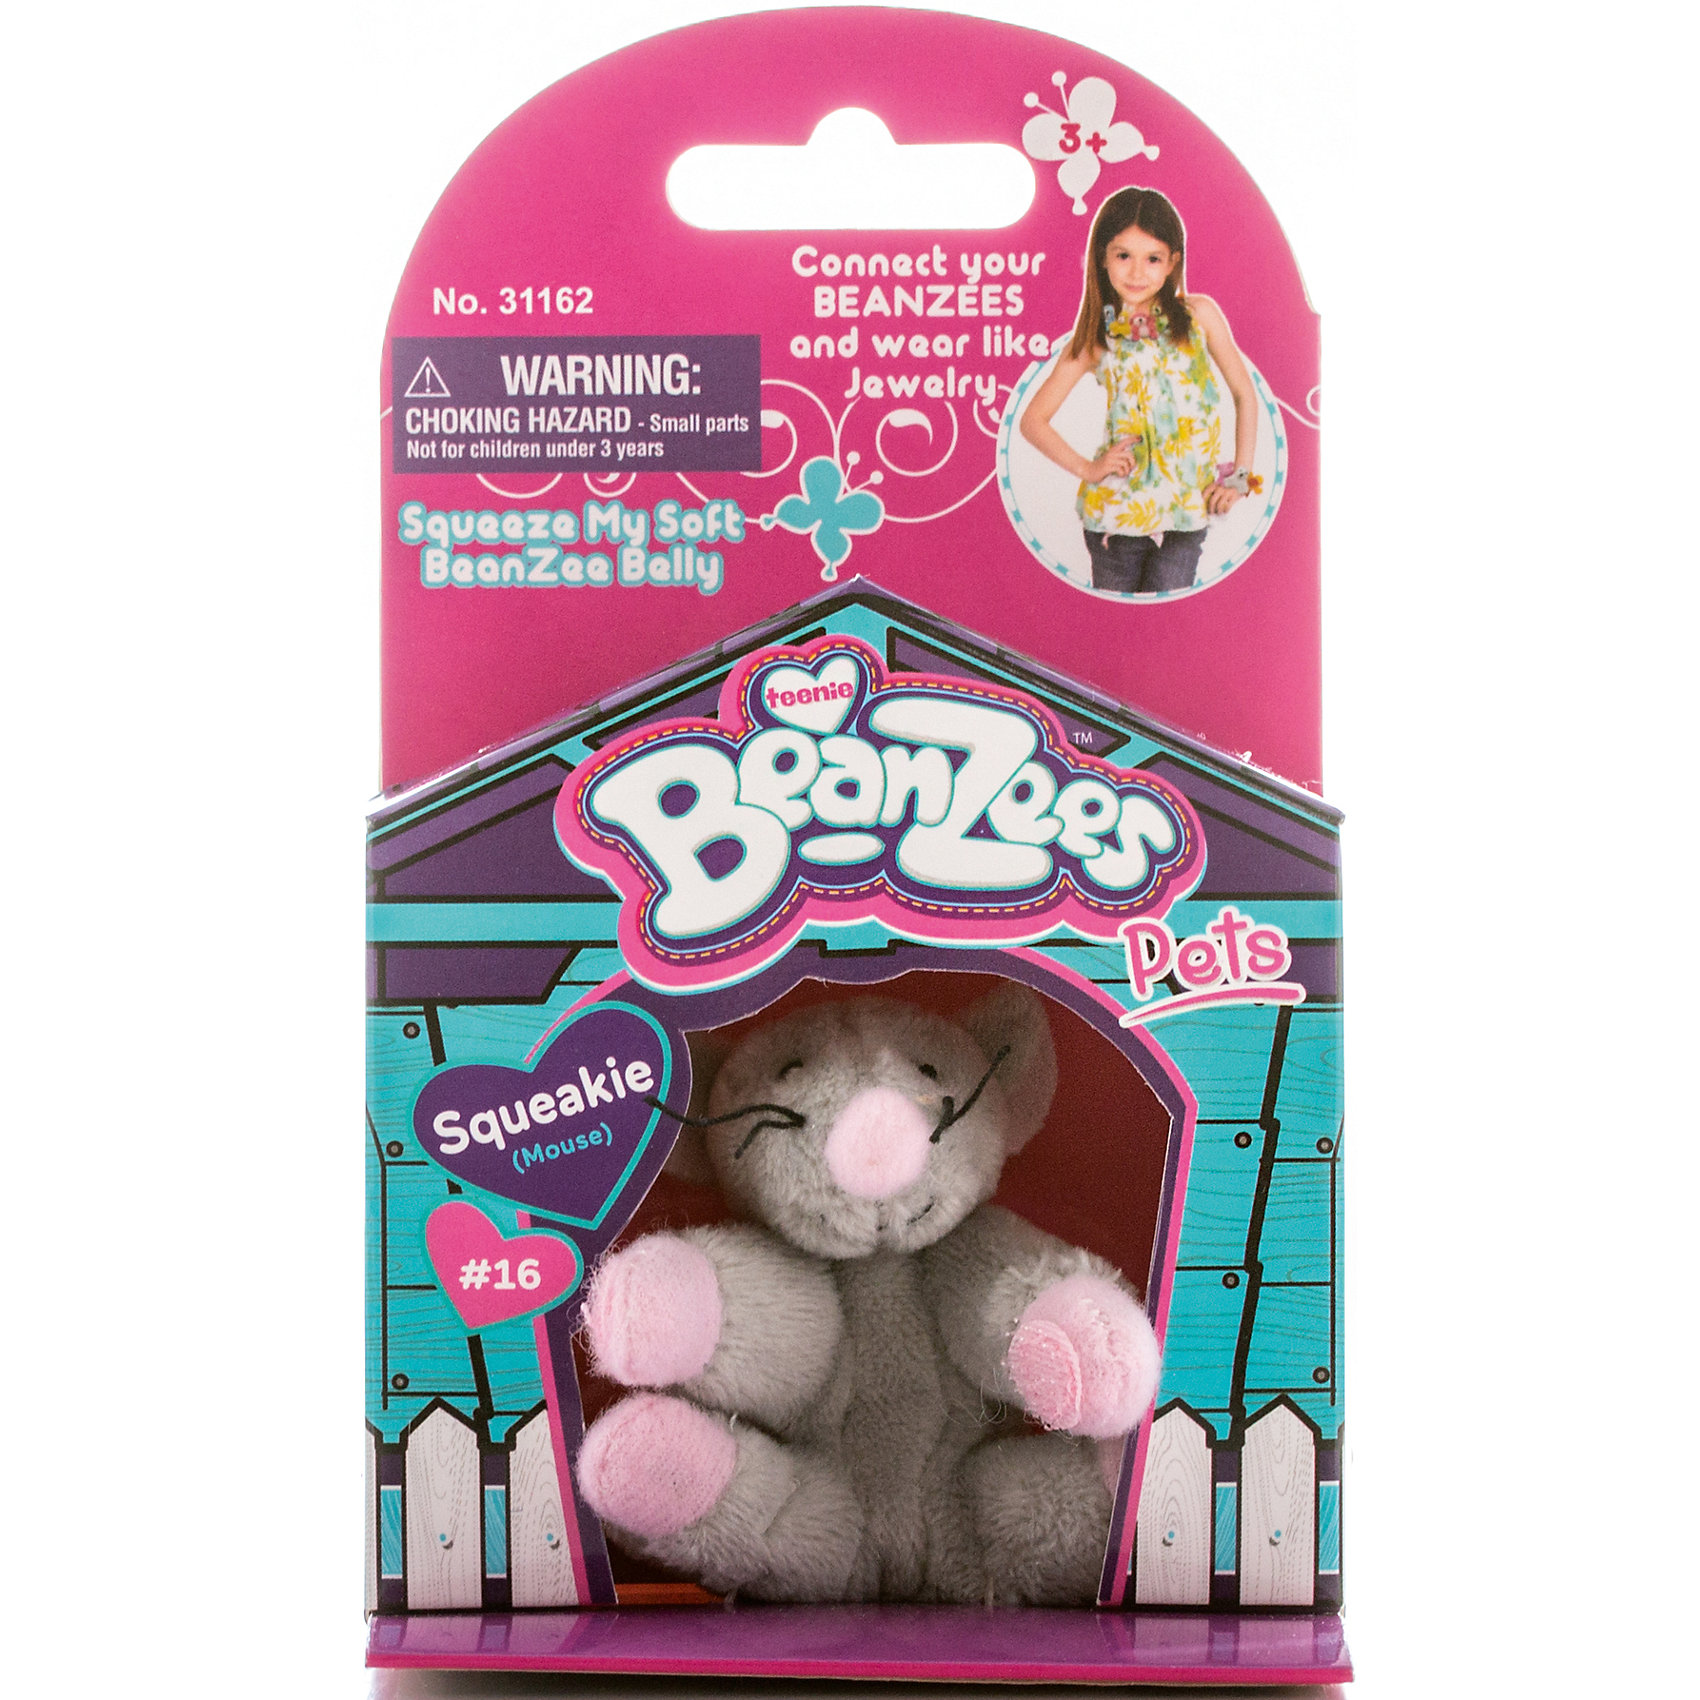 Beanzeez Мини-плюш Мышь, Beanzeez 4moms электронное mamaroo 3 0 серый плюш